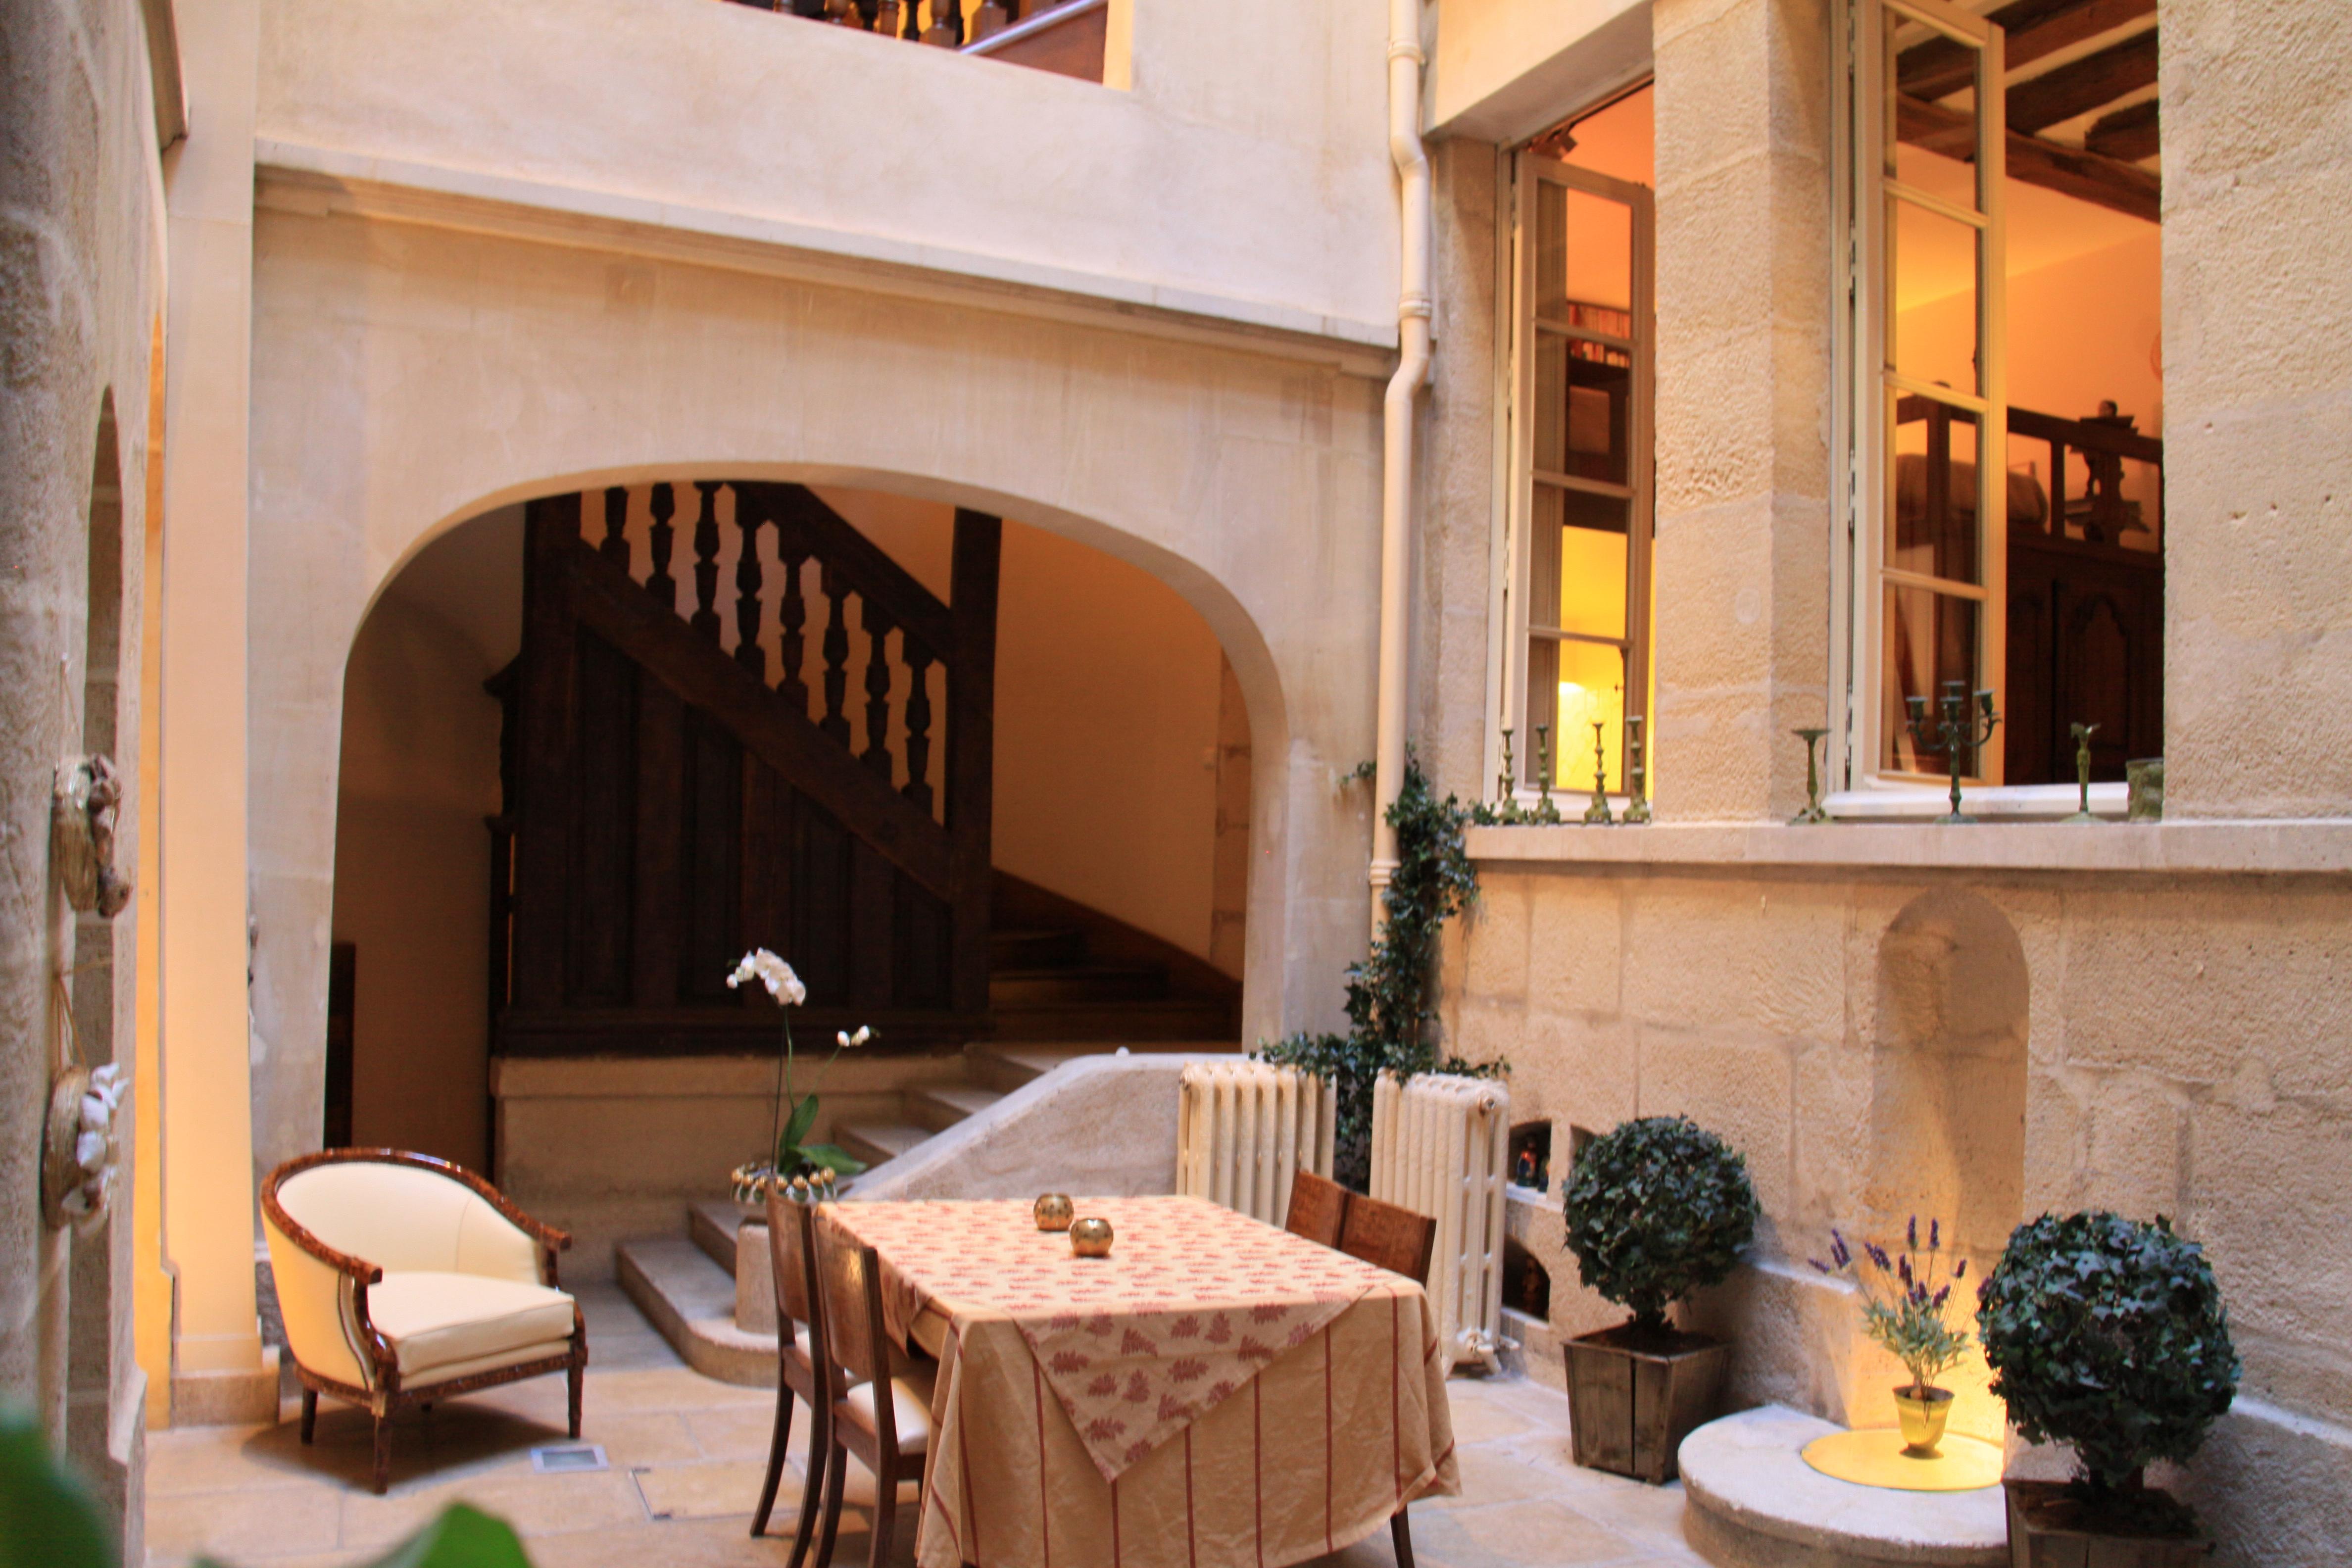 Maison Du0027Anne U2013 Paris Historic Bed U0026 Breakfast U2013 Live A Few Blocks ...